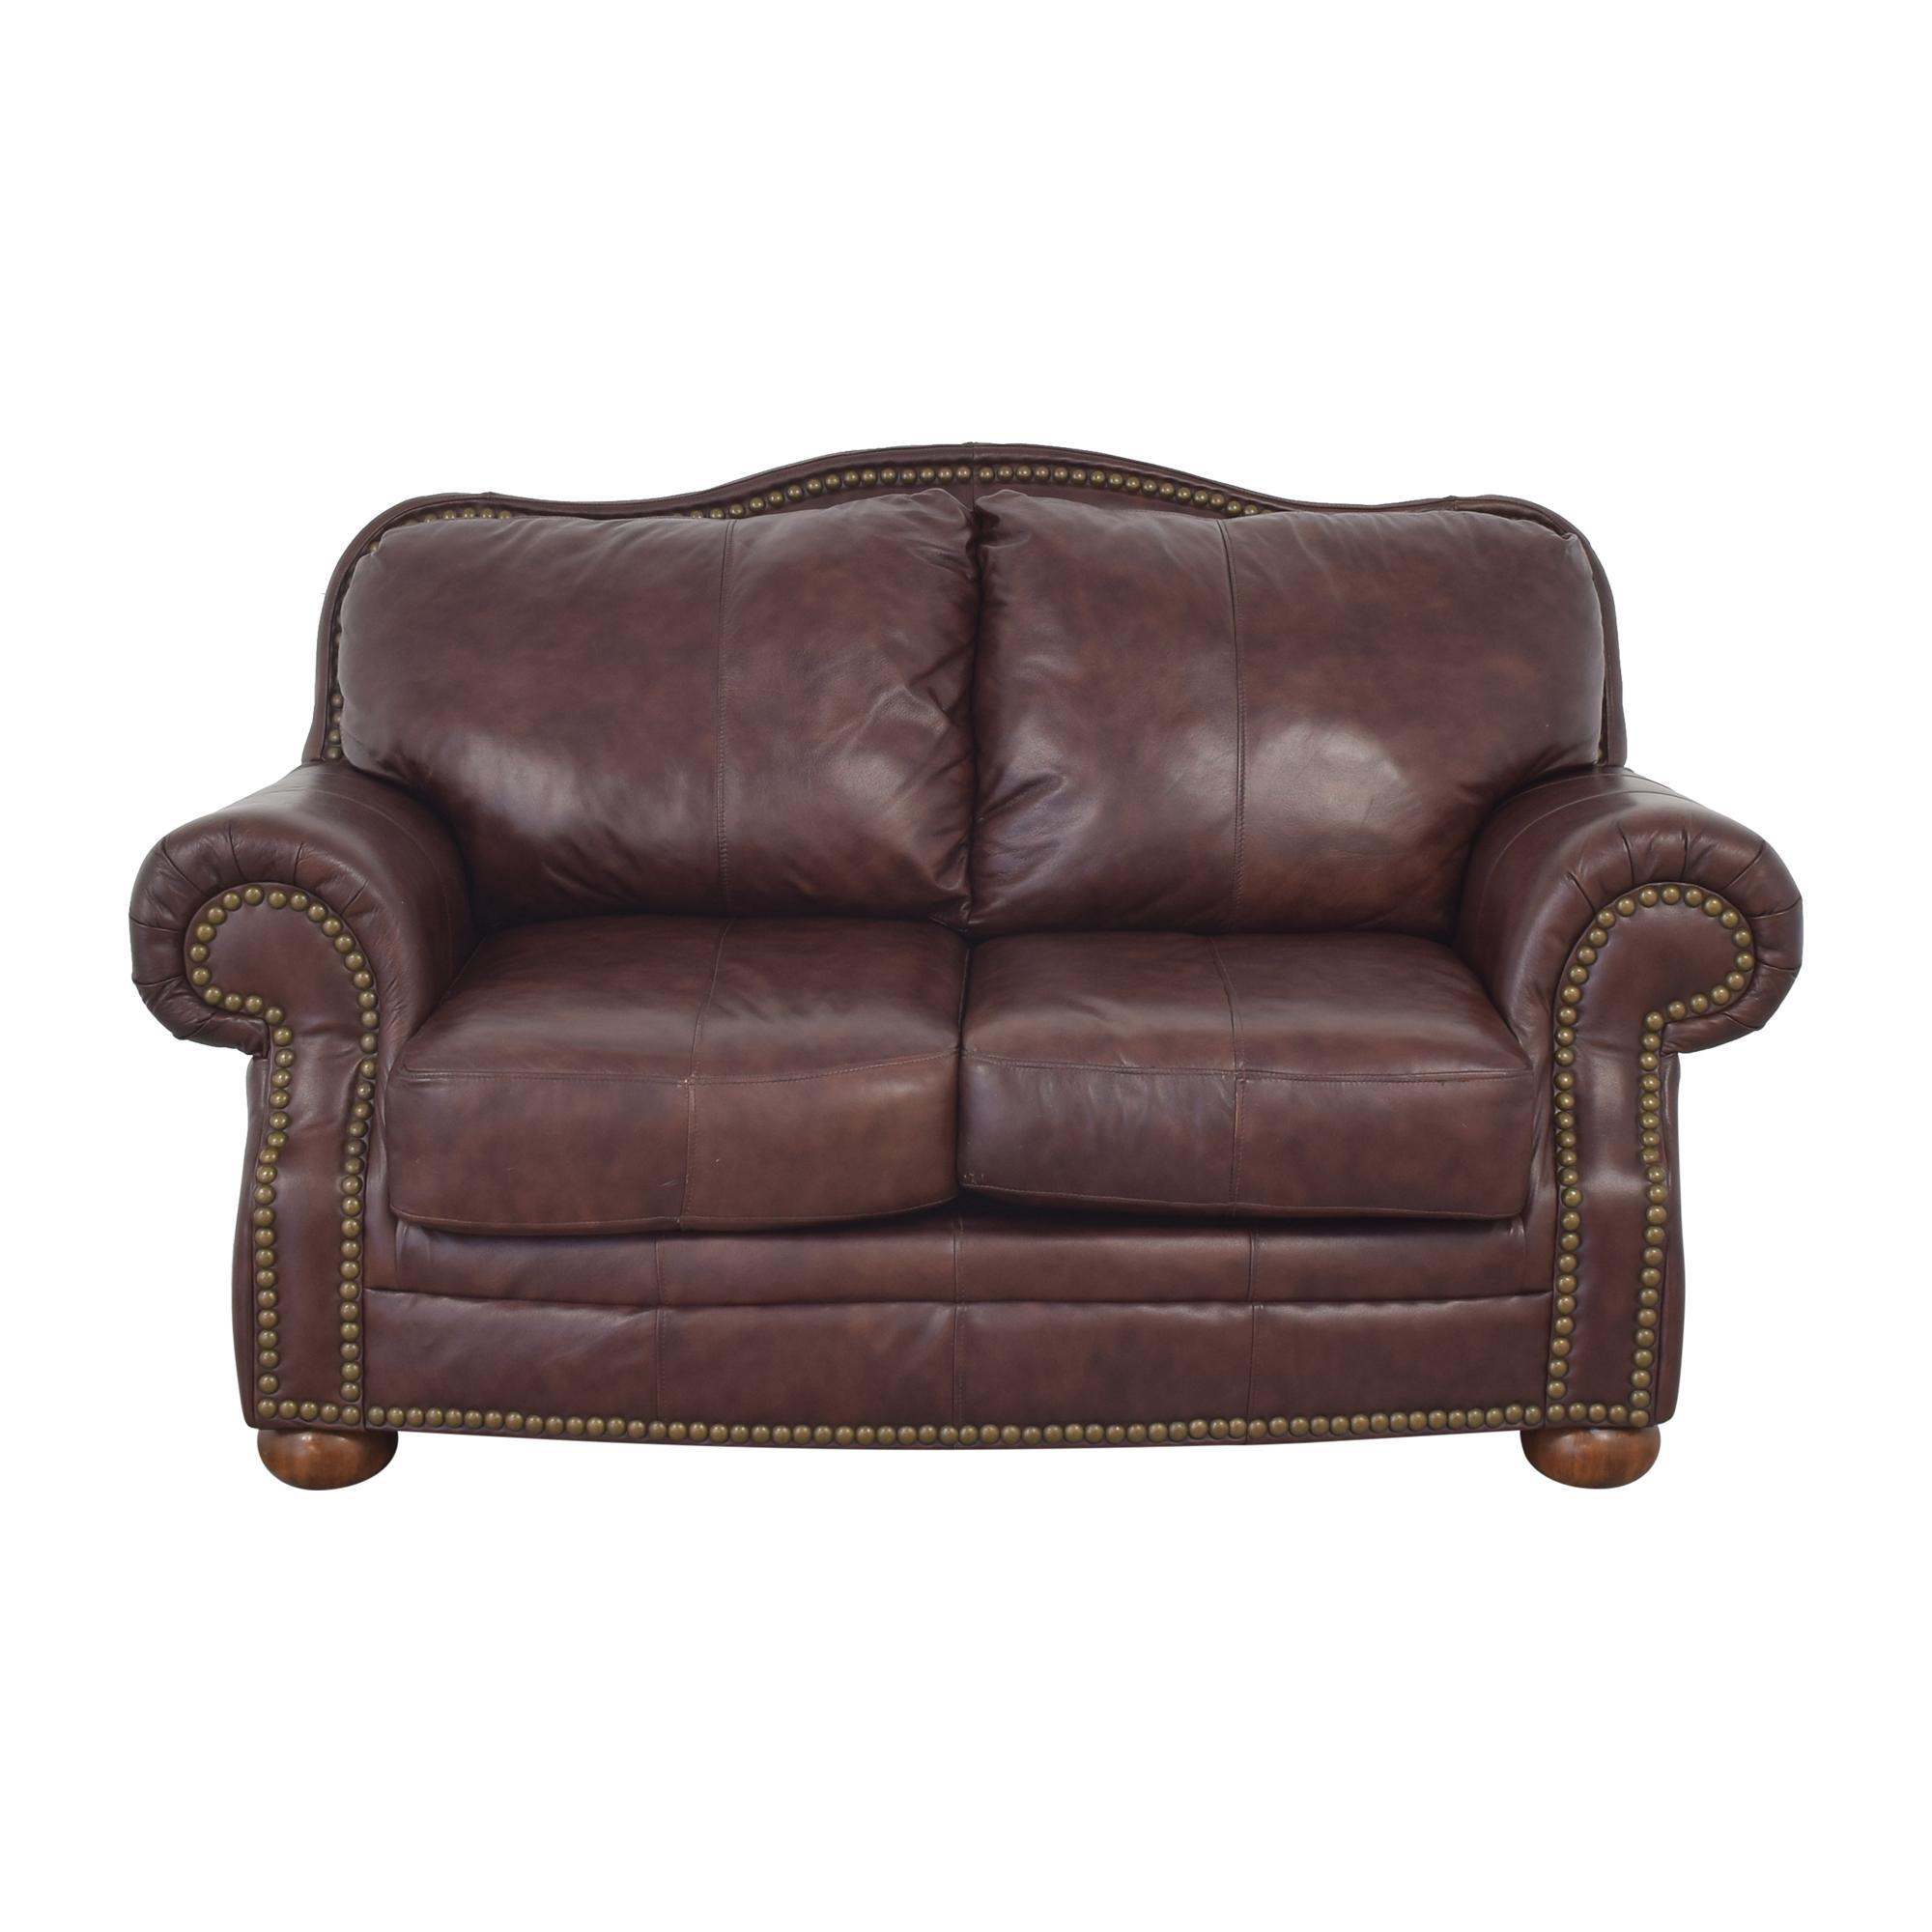 Ashley Furniture Ashley Furniture Nailhead Trim Loveseat dark brown